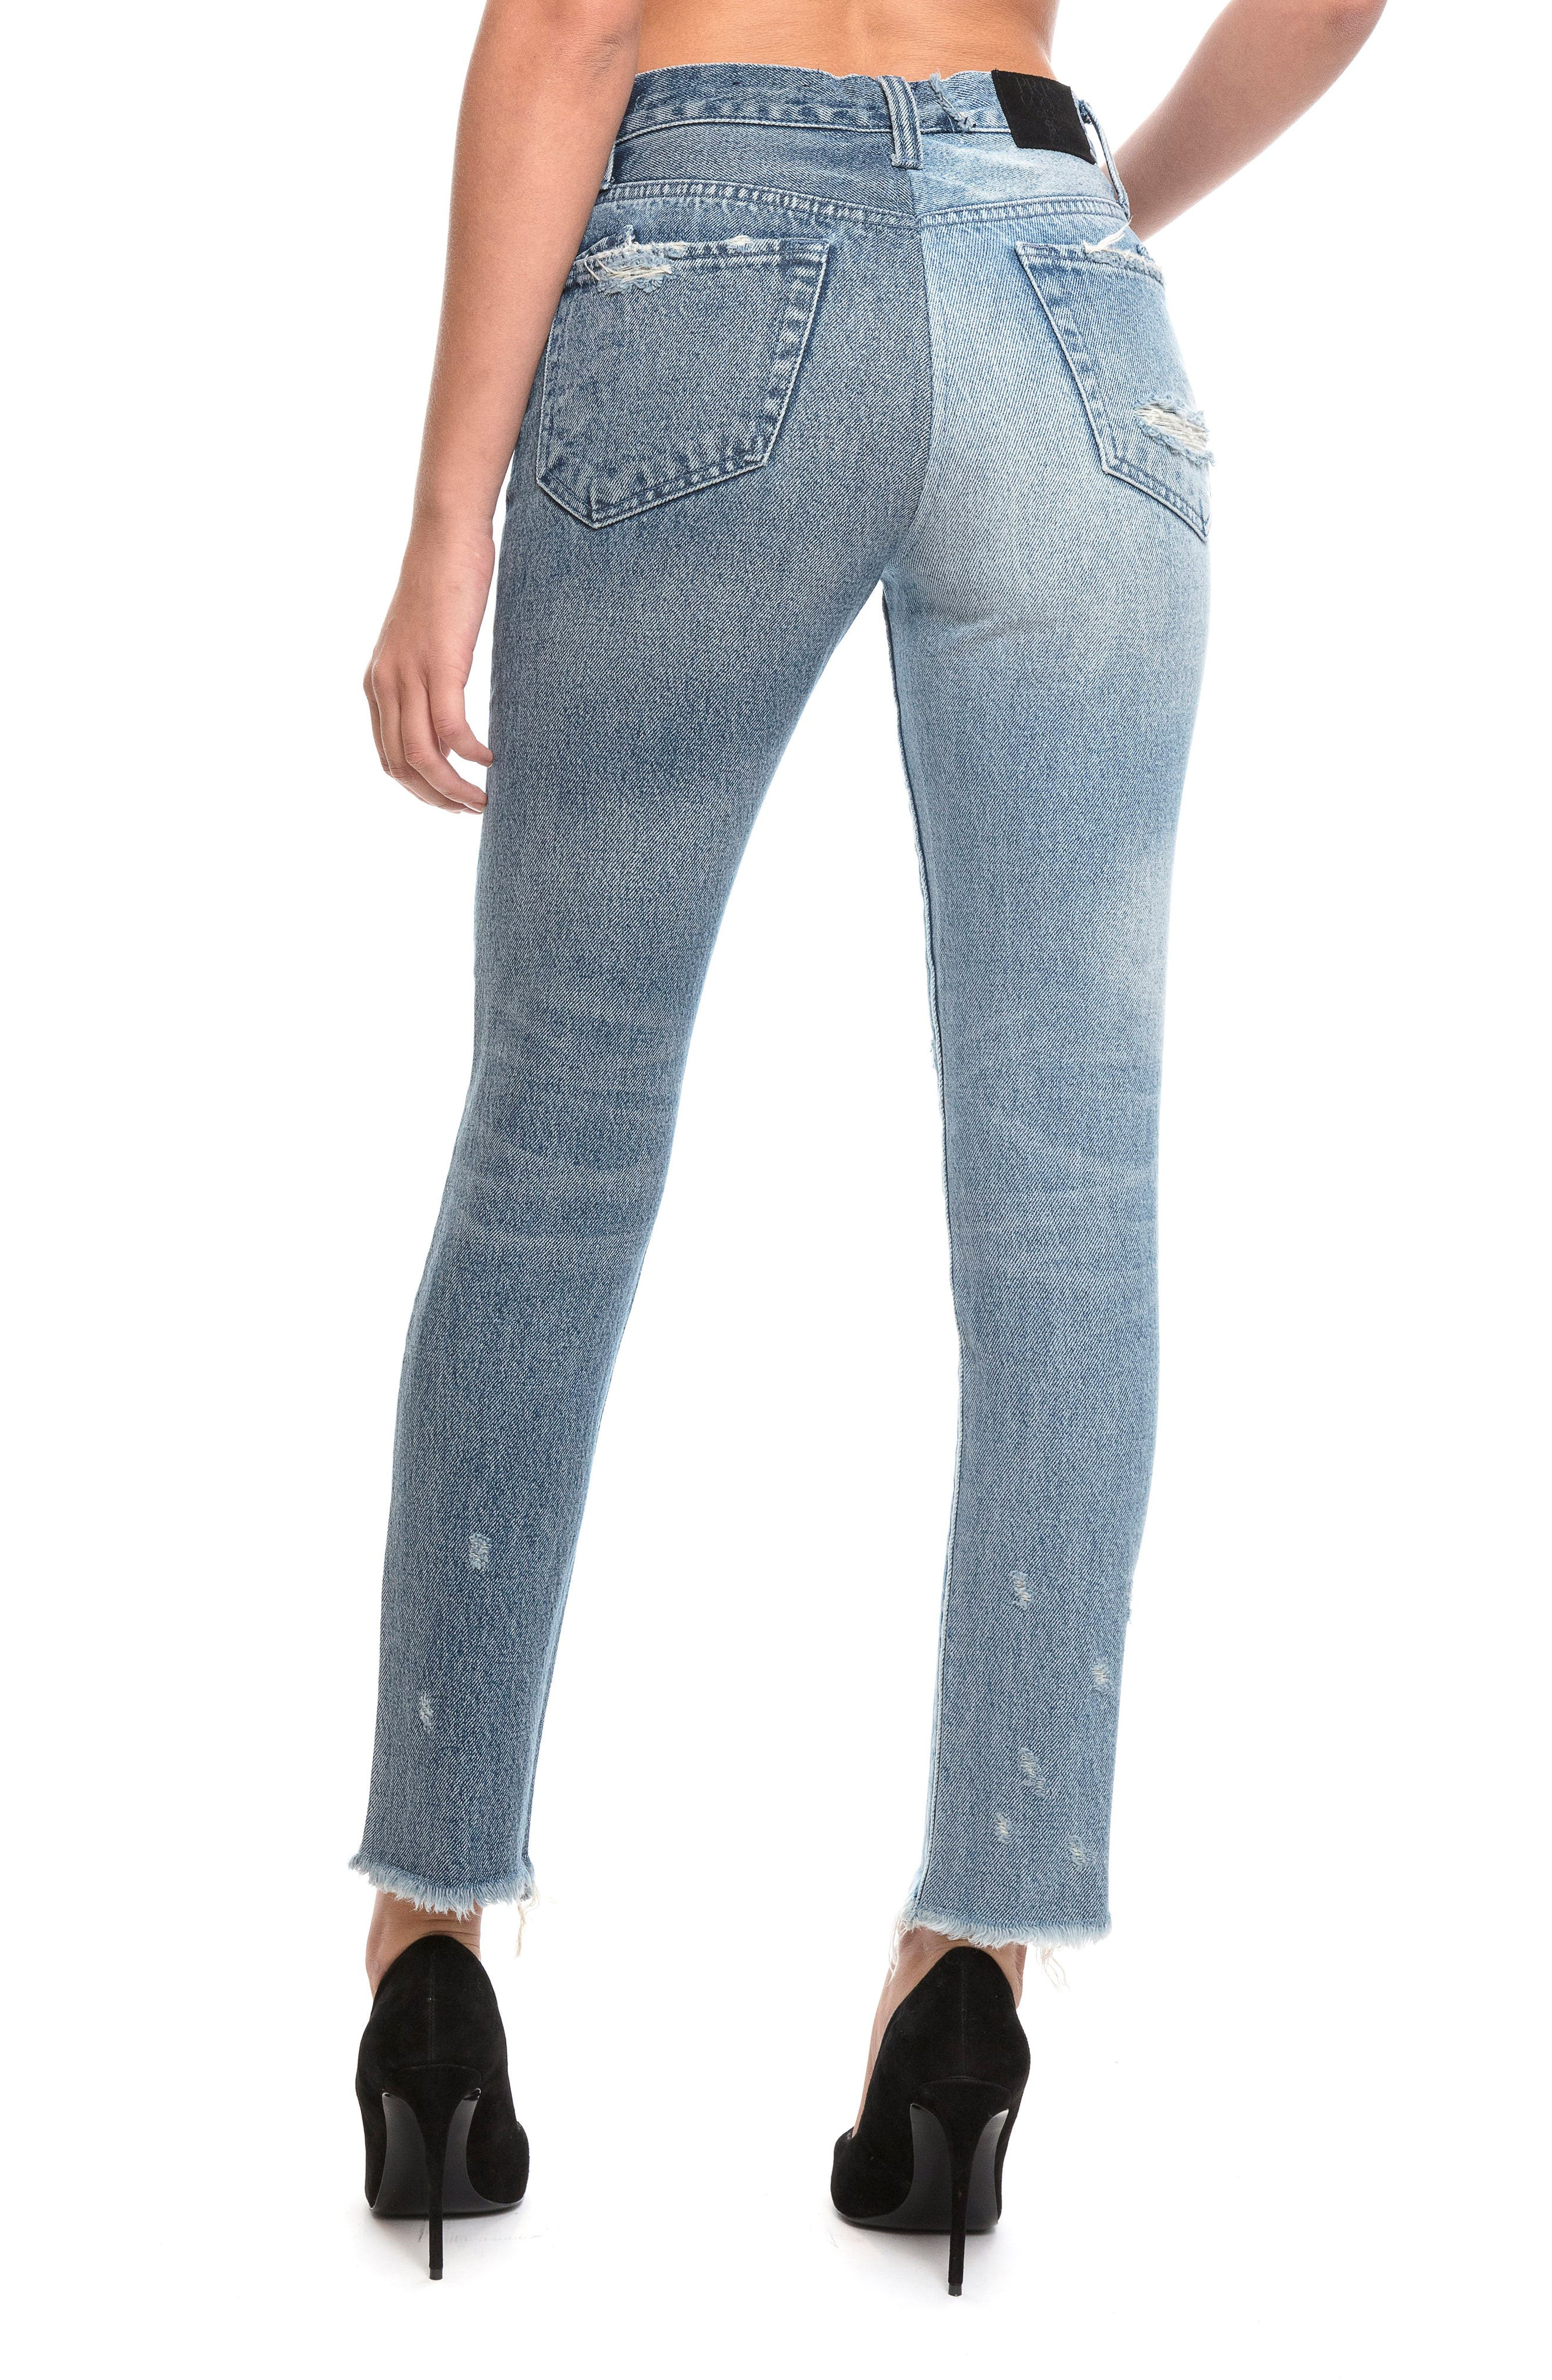 Chevelle Ankle Skinny Jeans,                             Alternate thumbnail 2, color,                             Indigo